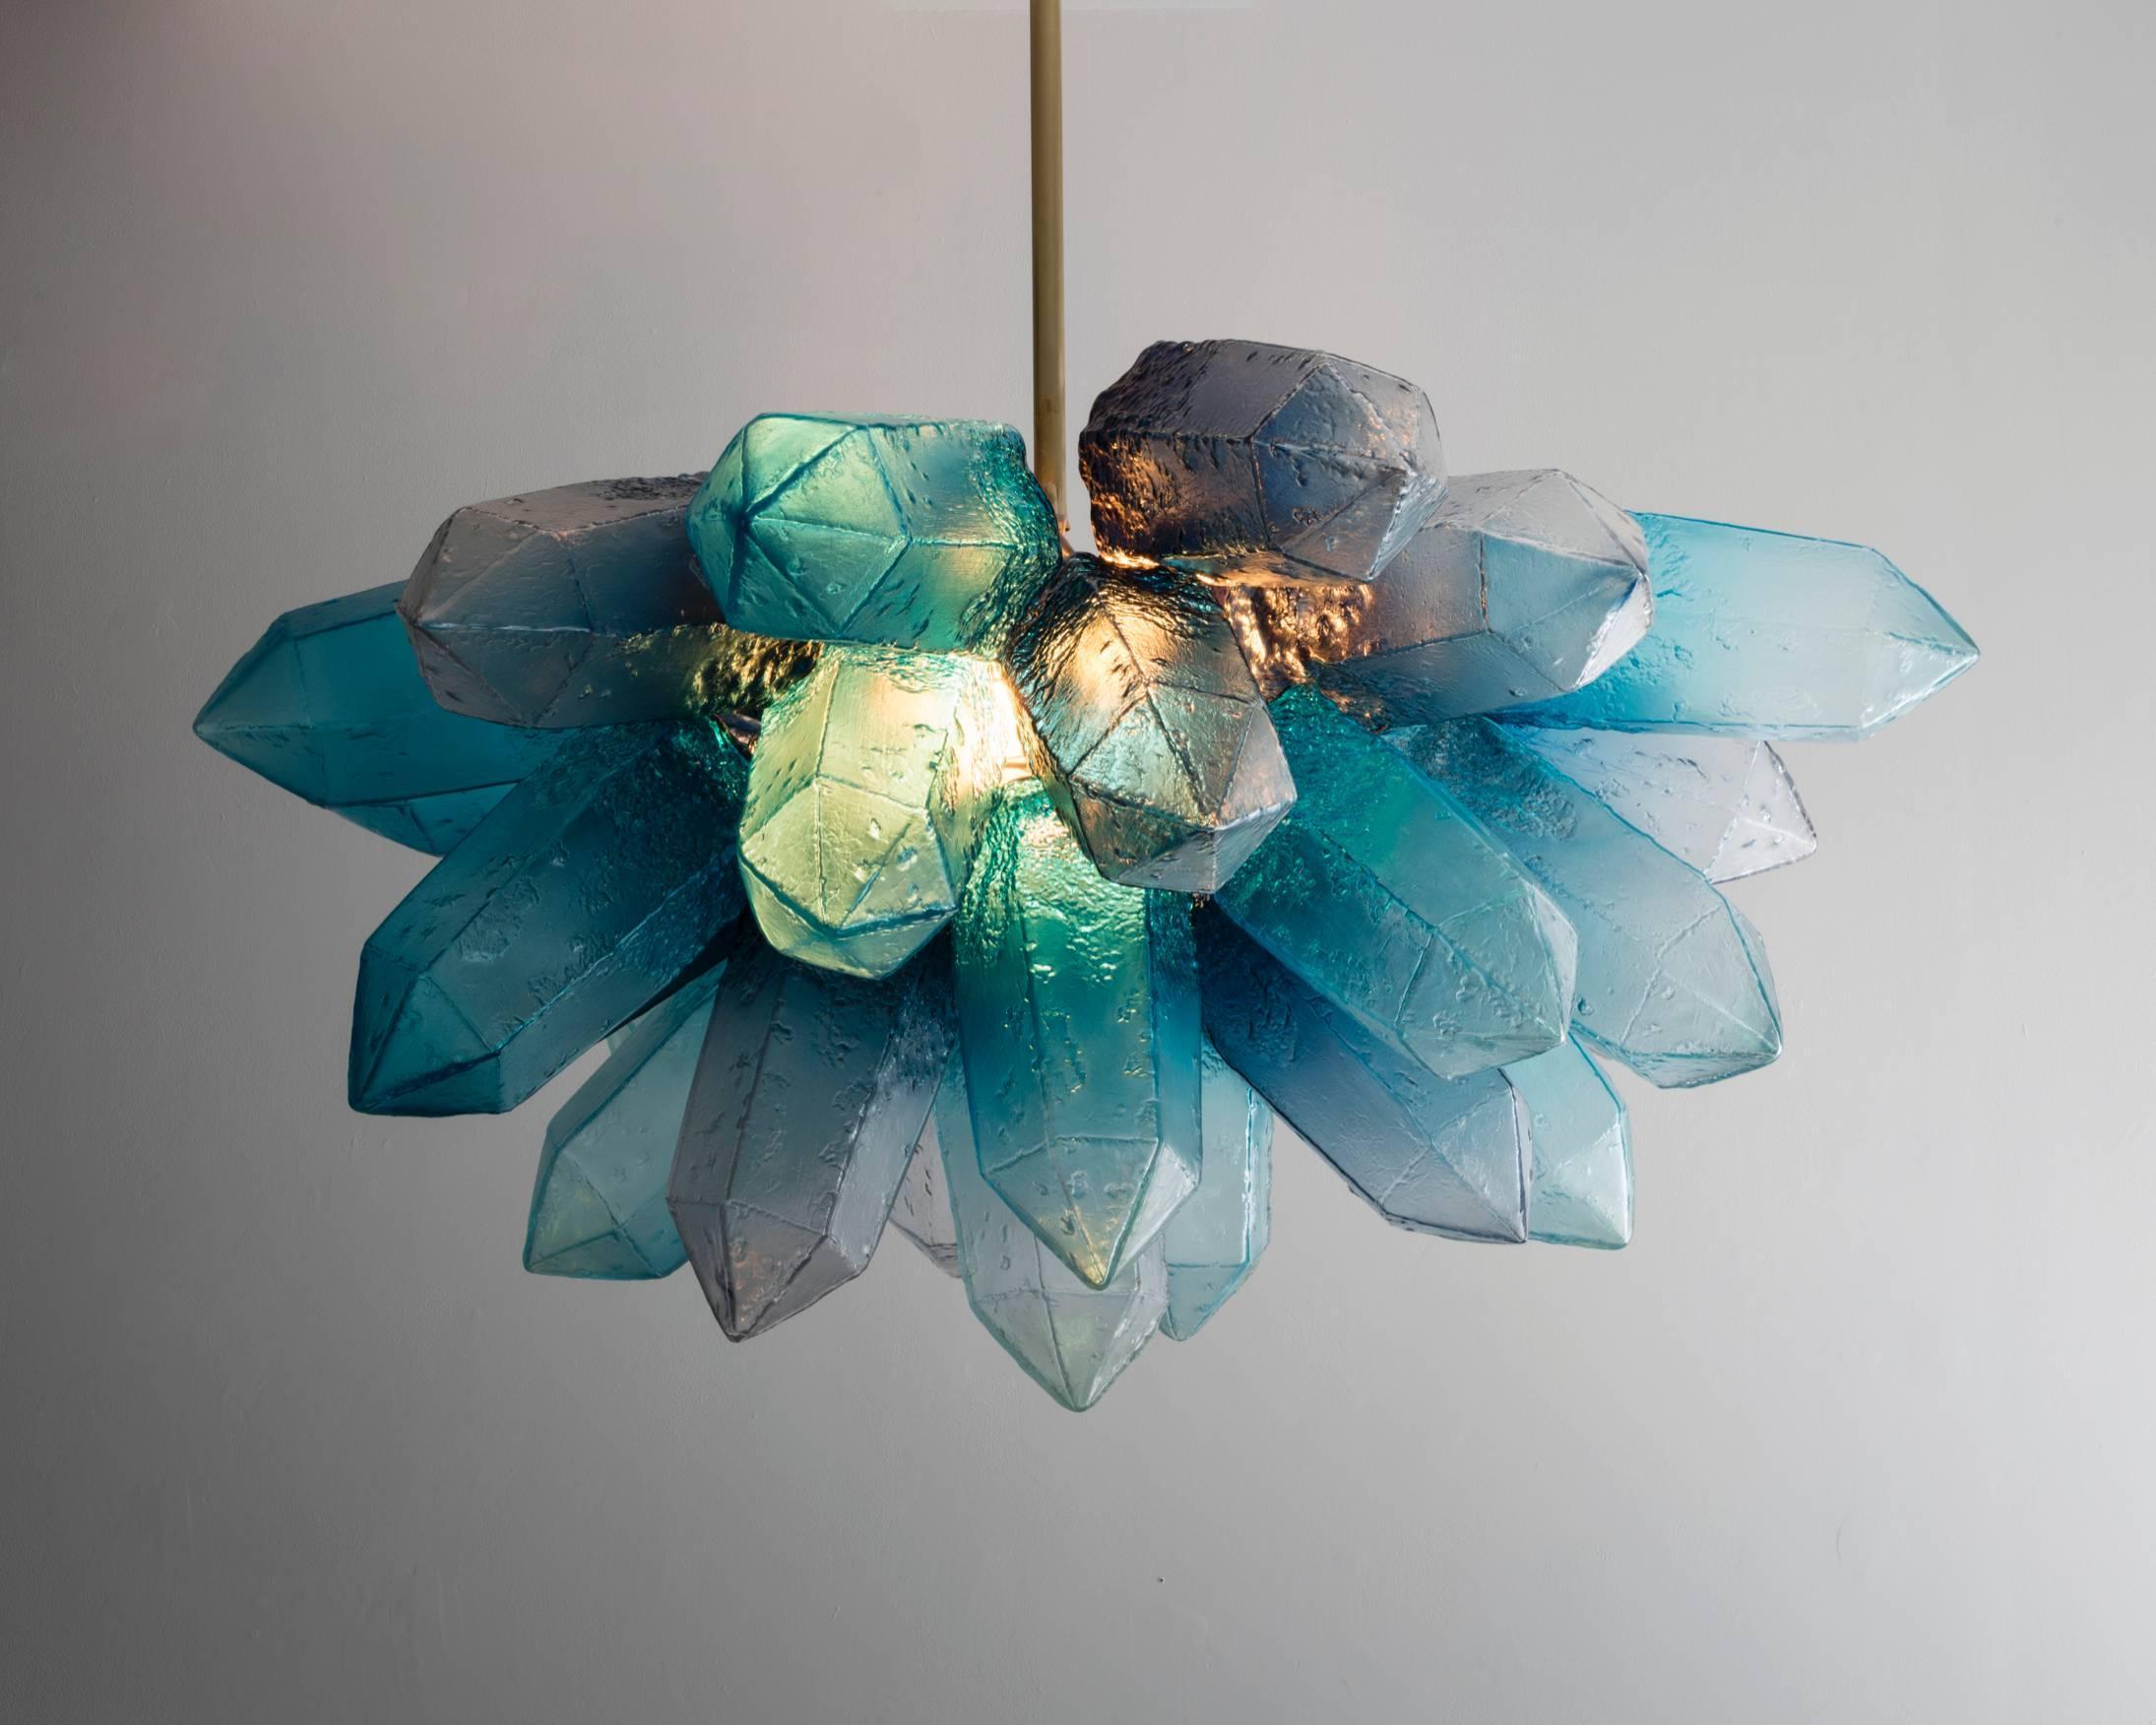 zimmerman lighting. Perfect Lighting Zimmerman Lighting Illuminated Crystal Cluster By Jeff Zimmerman Usa 2016 For & Zimmerman Lighting Modren Lighting ...